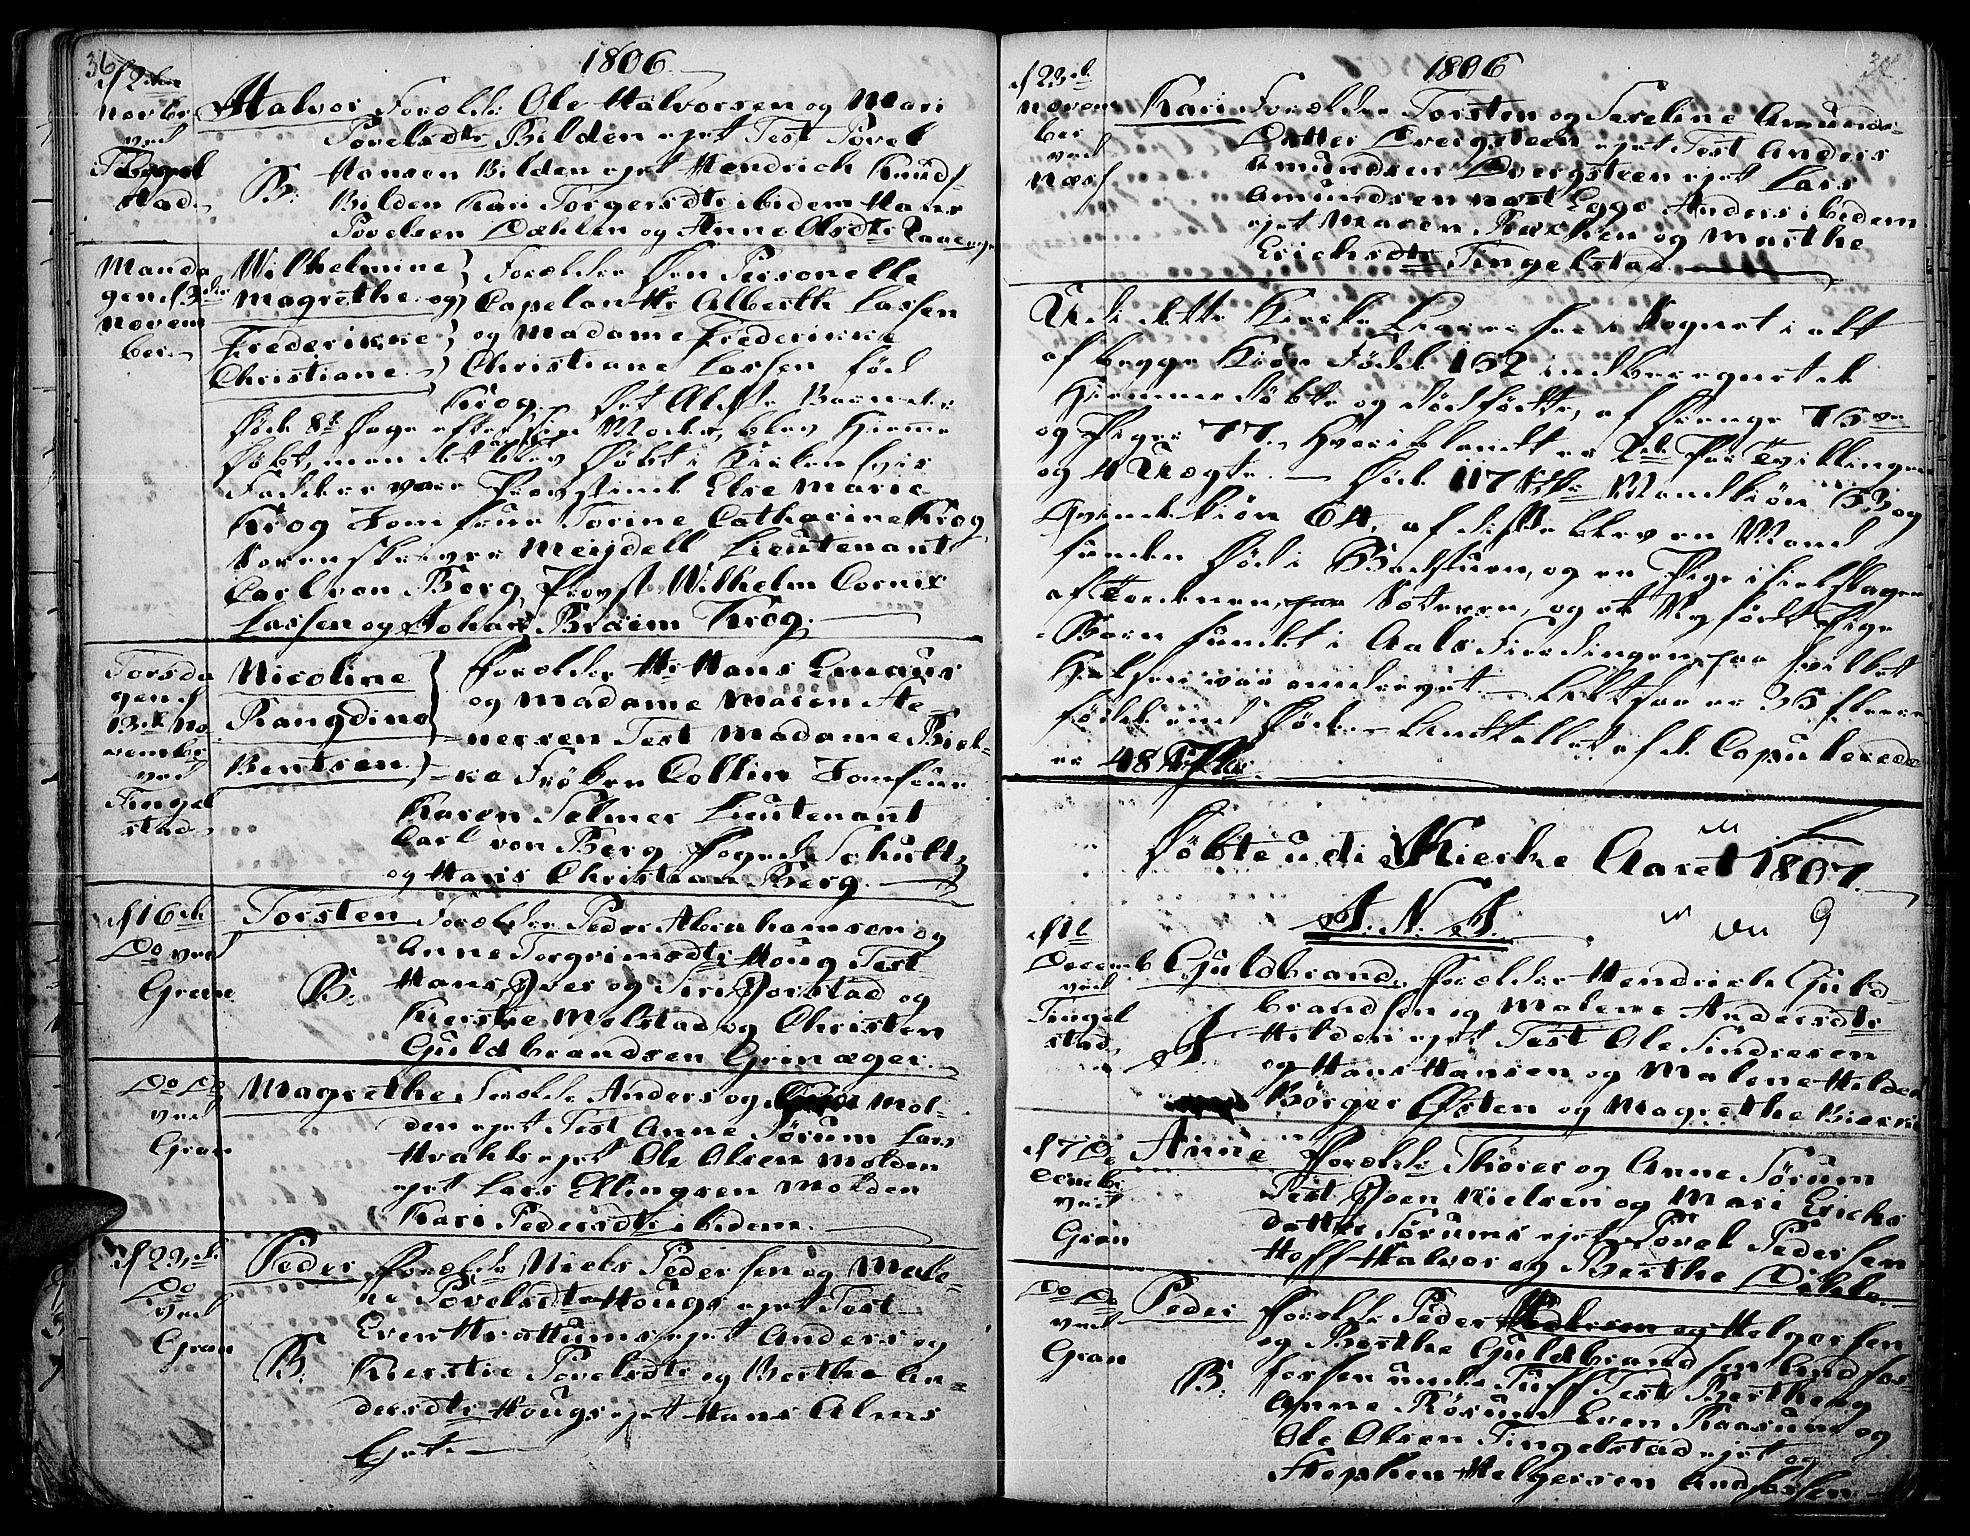 SAH, Gran prestekontor, Ministerialbok nr. 7, 1804-1815, s. 36-37